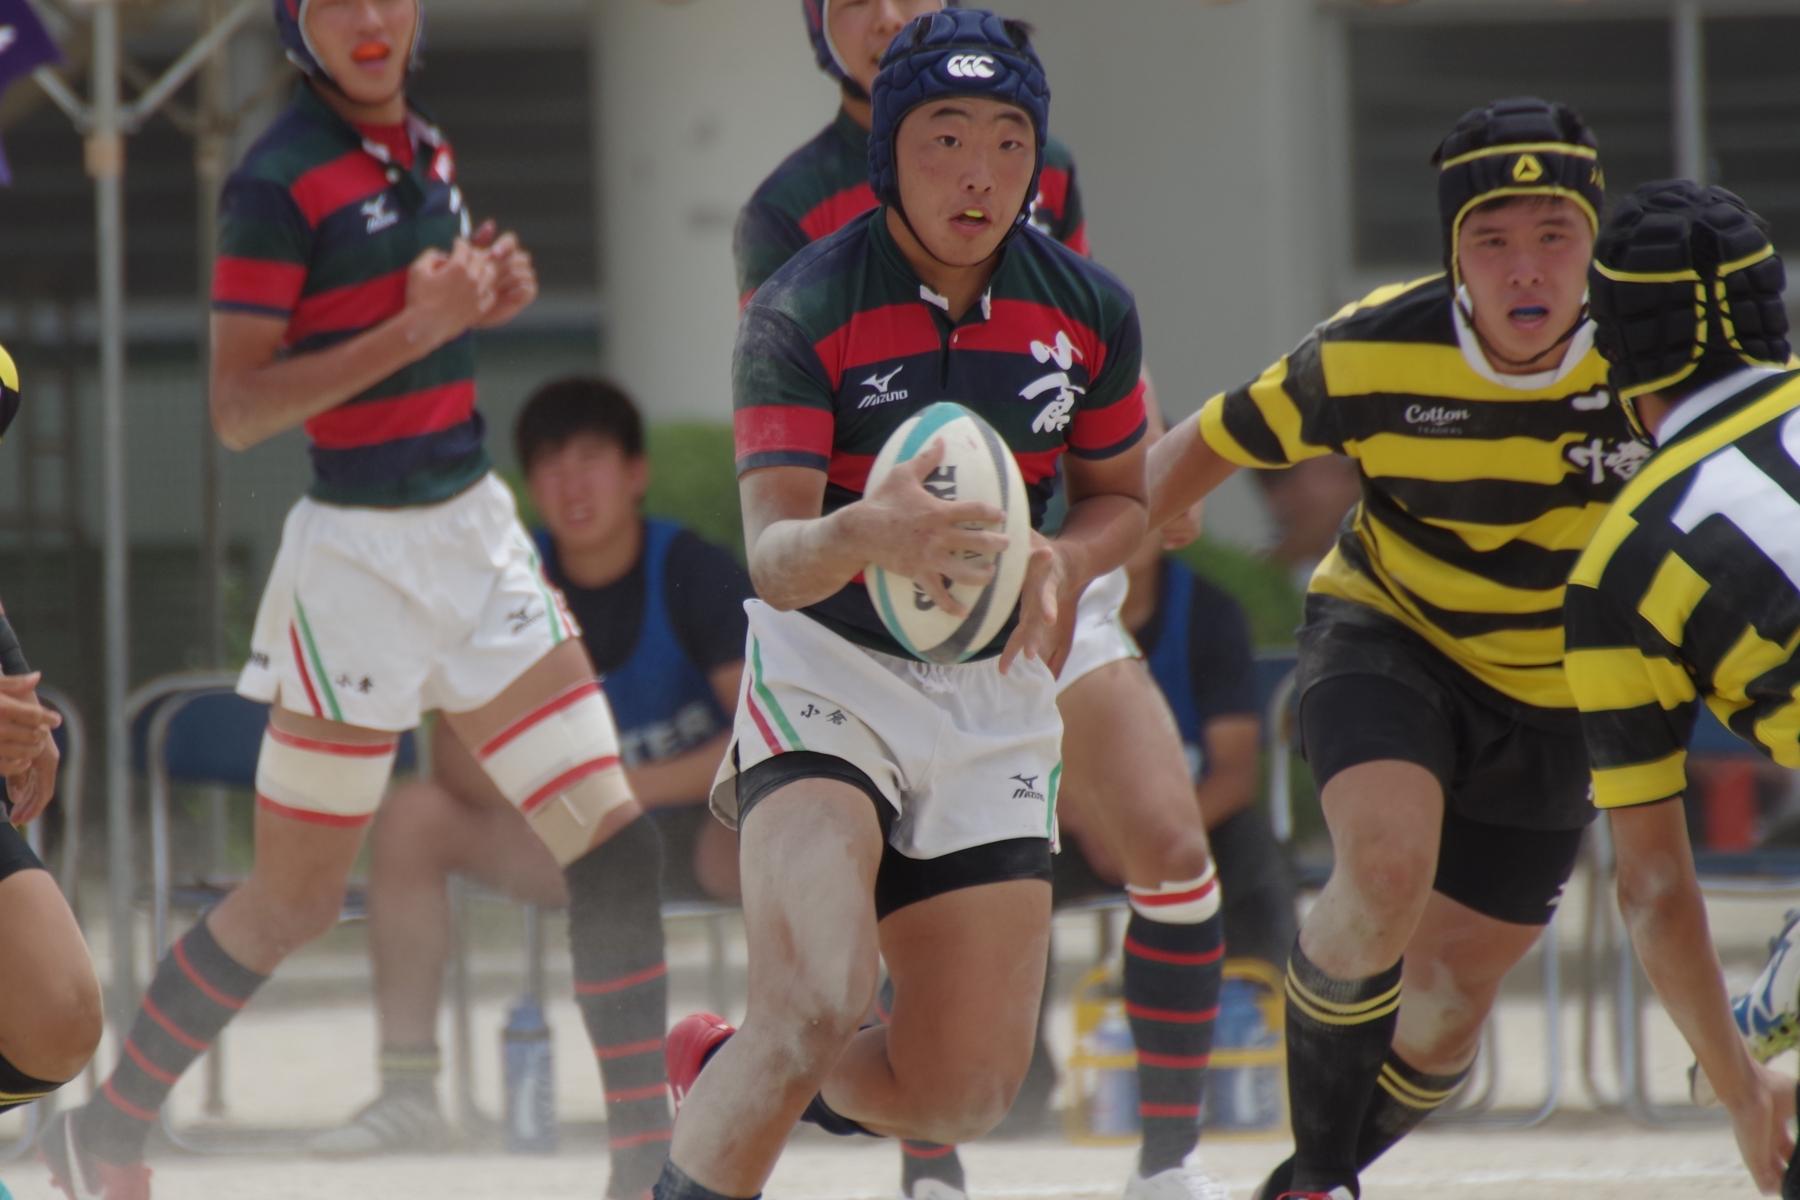 http://kokura-rugby.sakura.ne.jp/180527_131454_1176.jpg